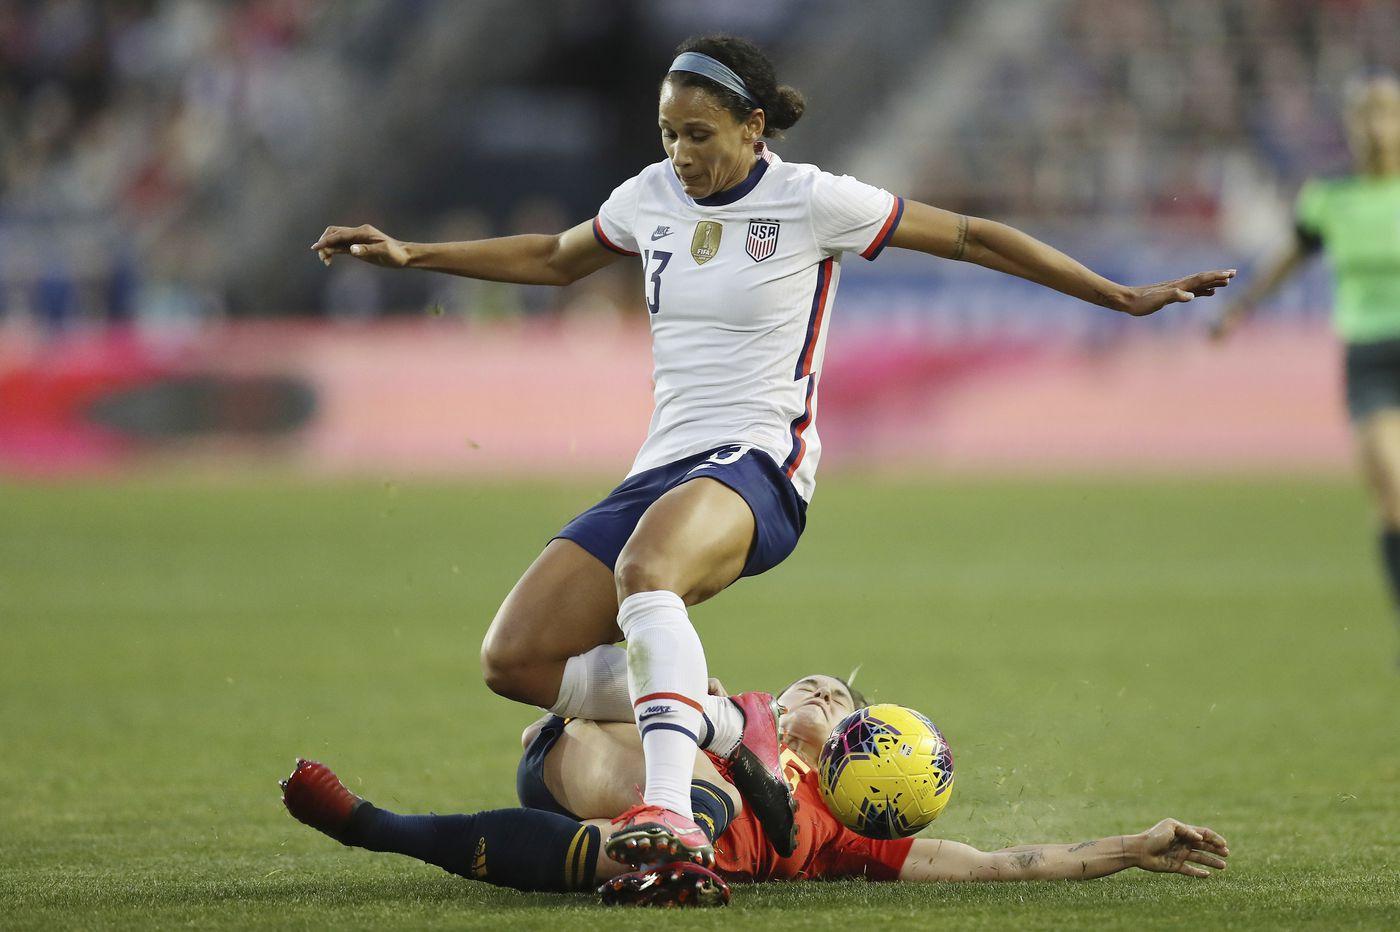 USWNT's forward battle with Carli Lloyd, Christen Press and Lynn Williams intensifies ahead of Olympics